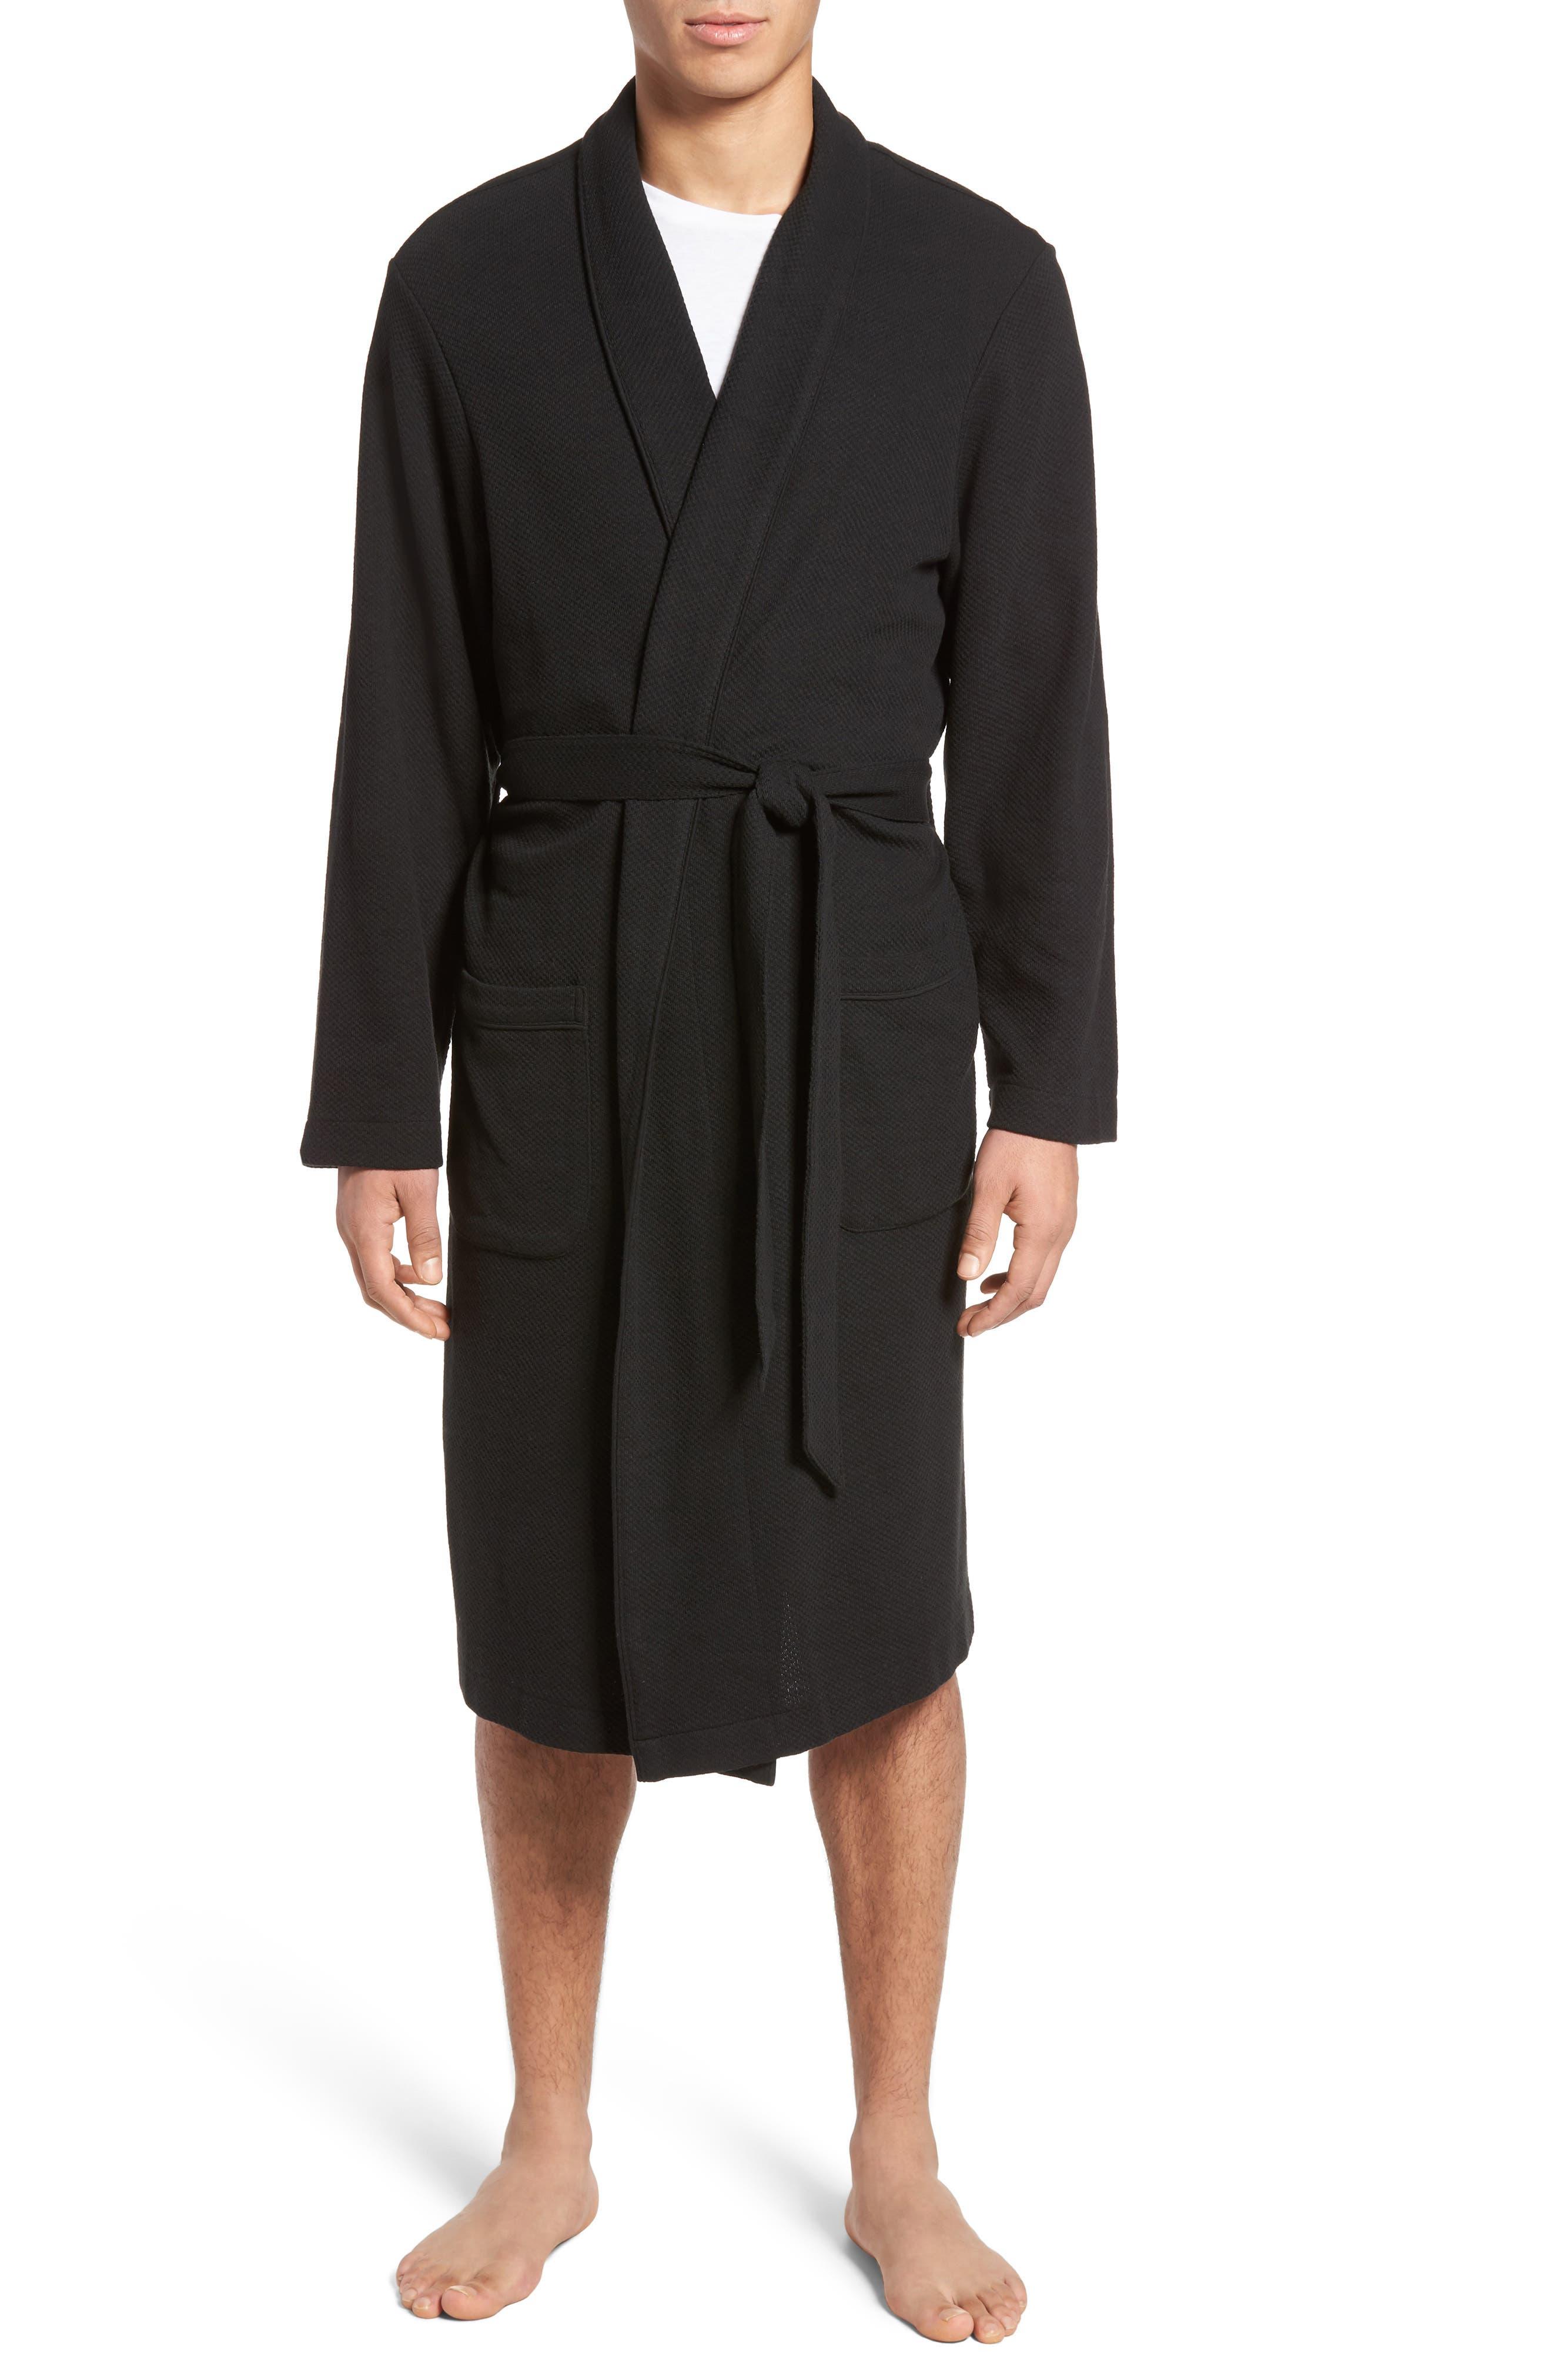 NORDSTROM MEN'S SHOP, Thermal Robe, Main thumbnail 1, color, 001